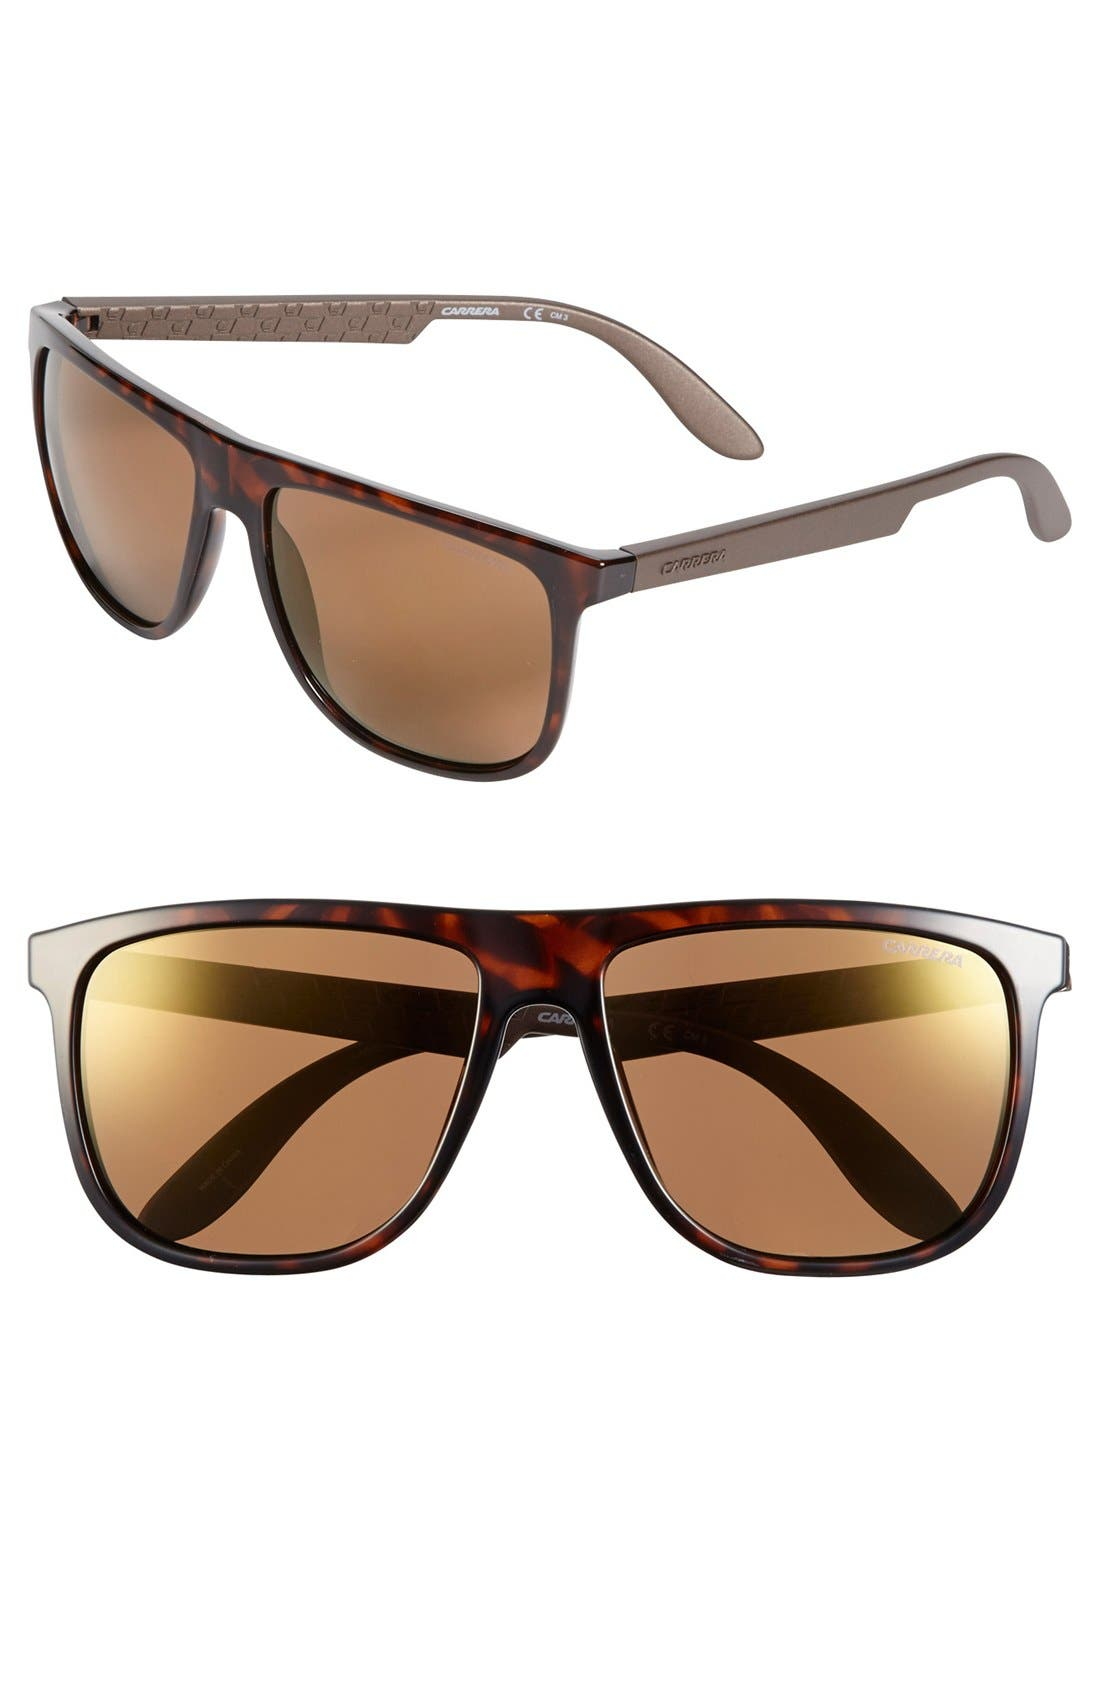 Alternate Image 1 Selected - Carrera Eyewear '5003' Sunglasses